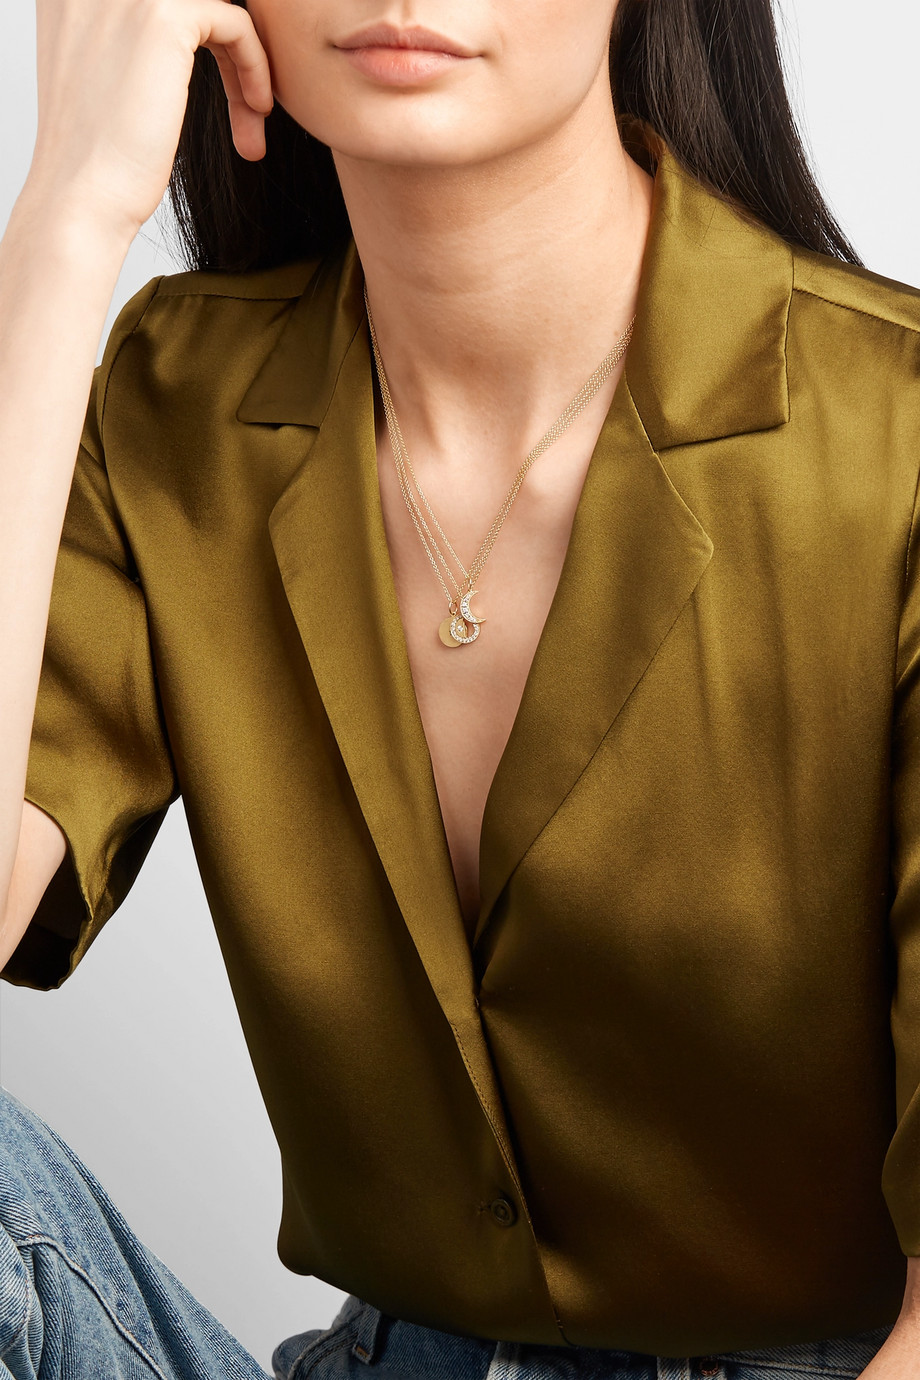 Andrea Fohrman Crescent Moon Kette aus 18 Karat Gold mit Diamanten